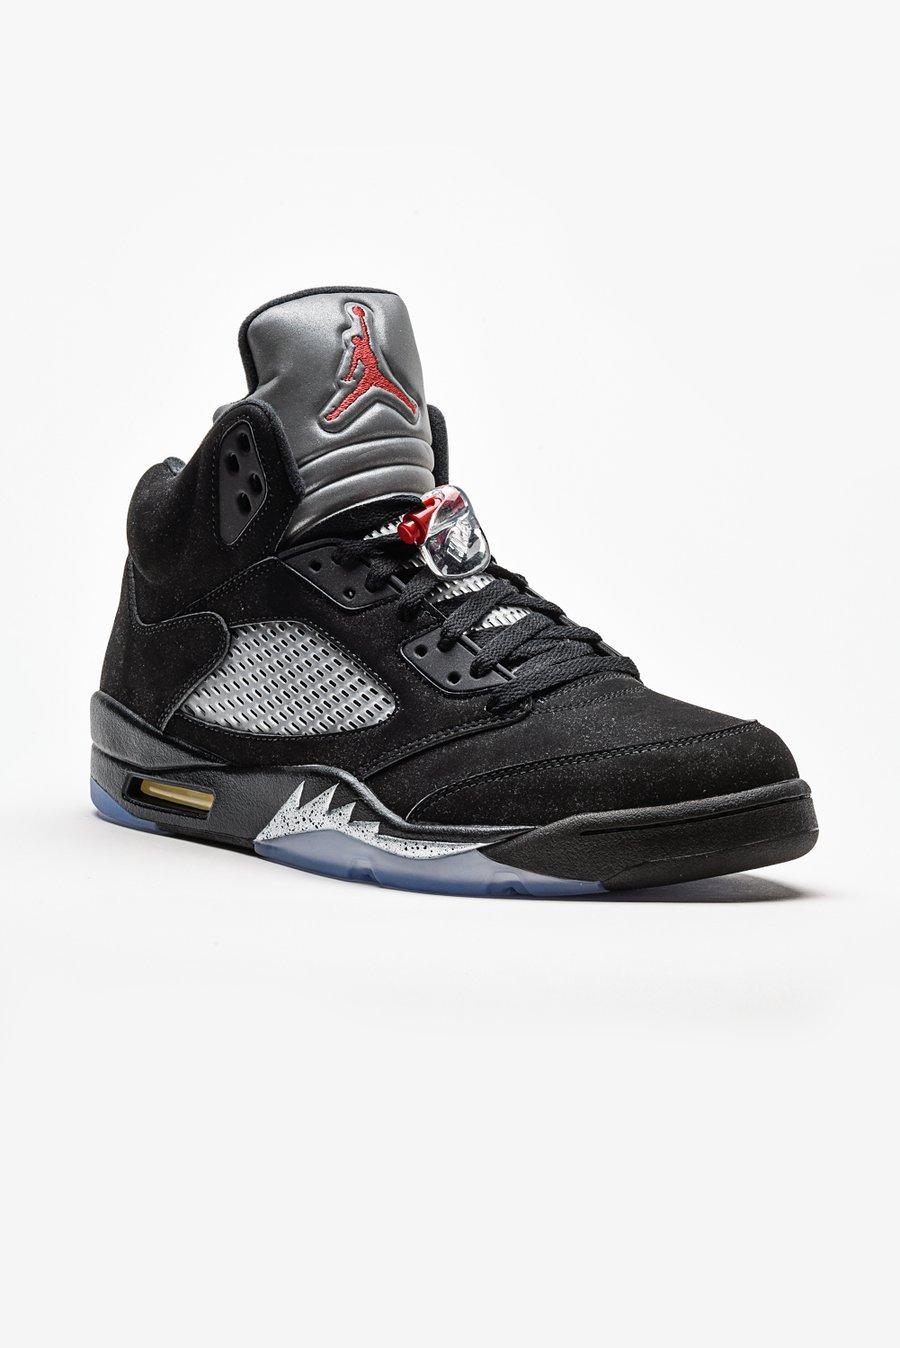 404857438dd4 ... Out  Image of Air Jordan 5 Retro - Black Metallic